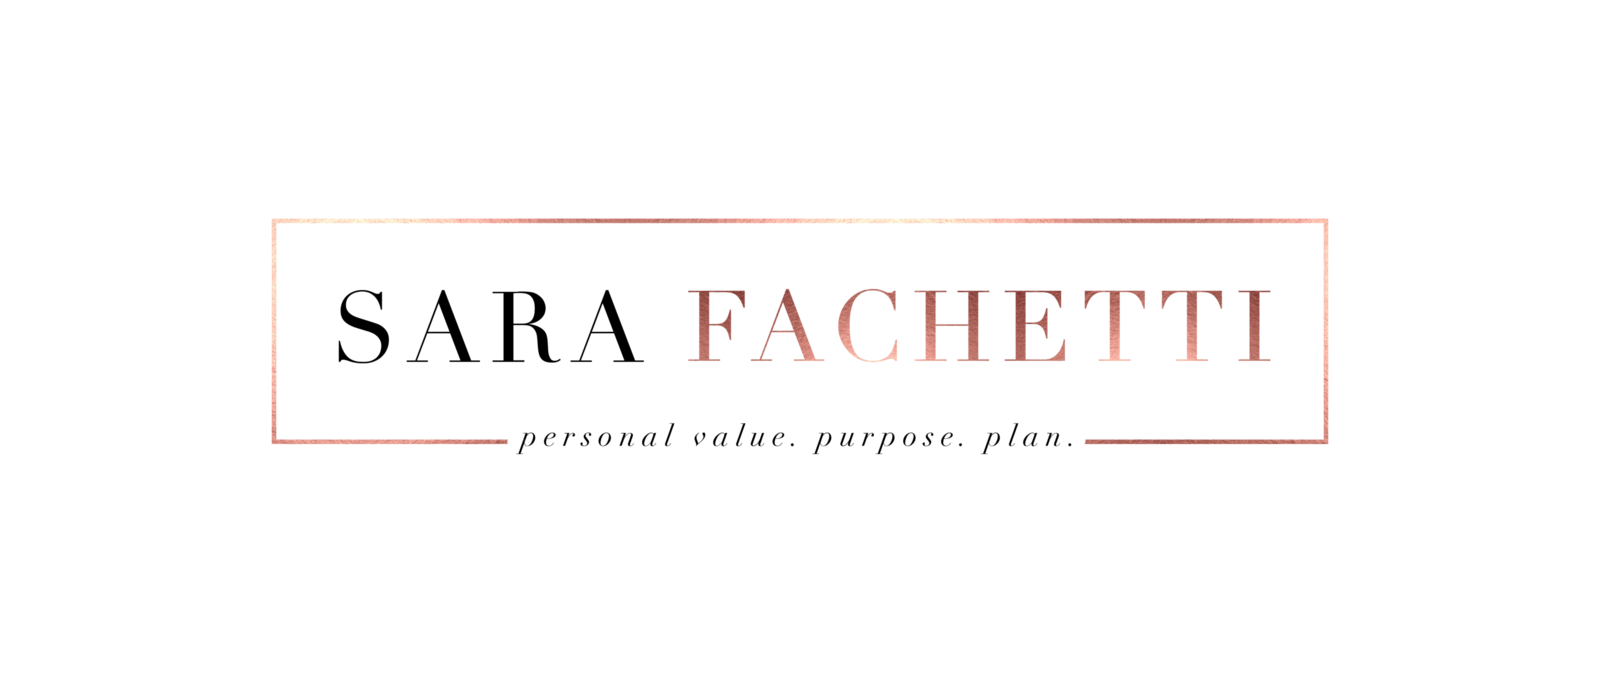 Sara Fachetti